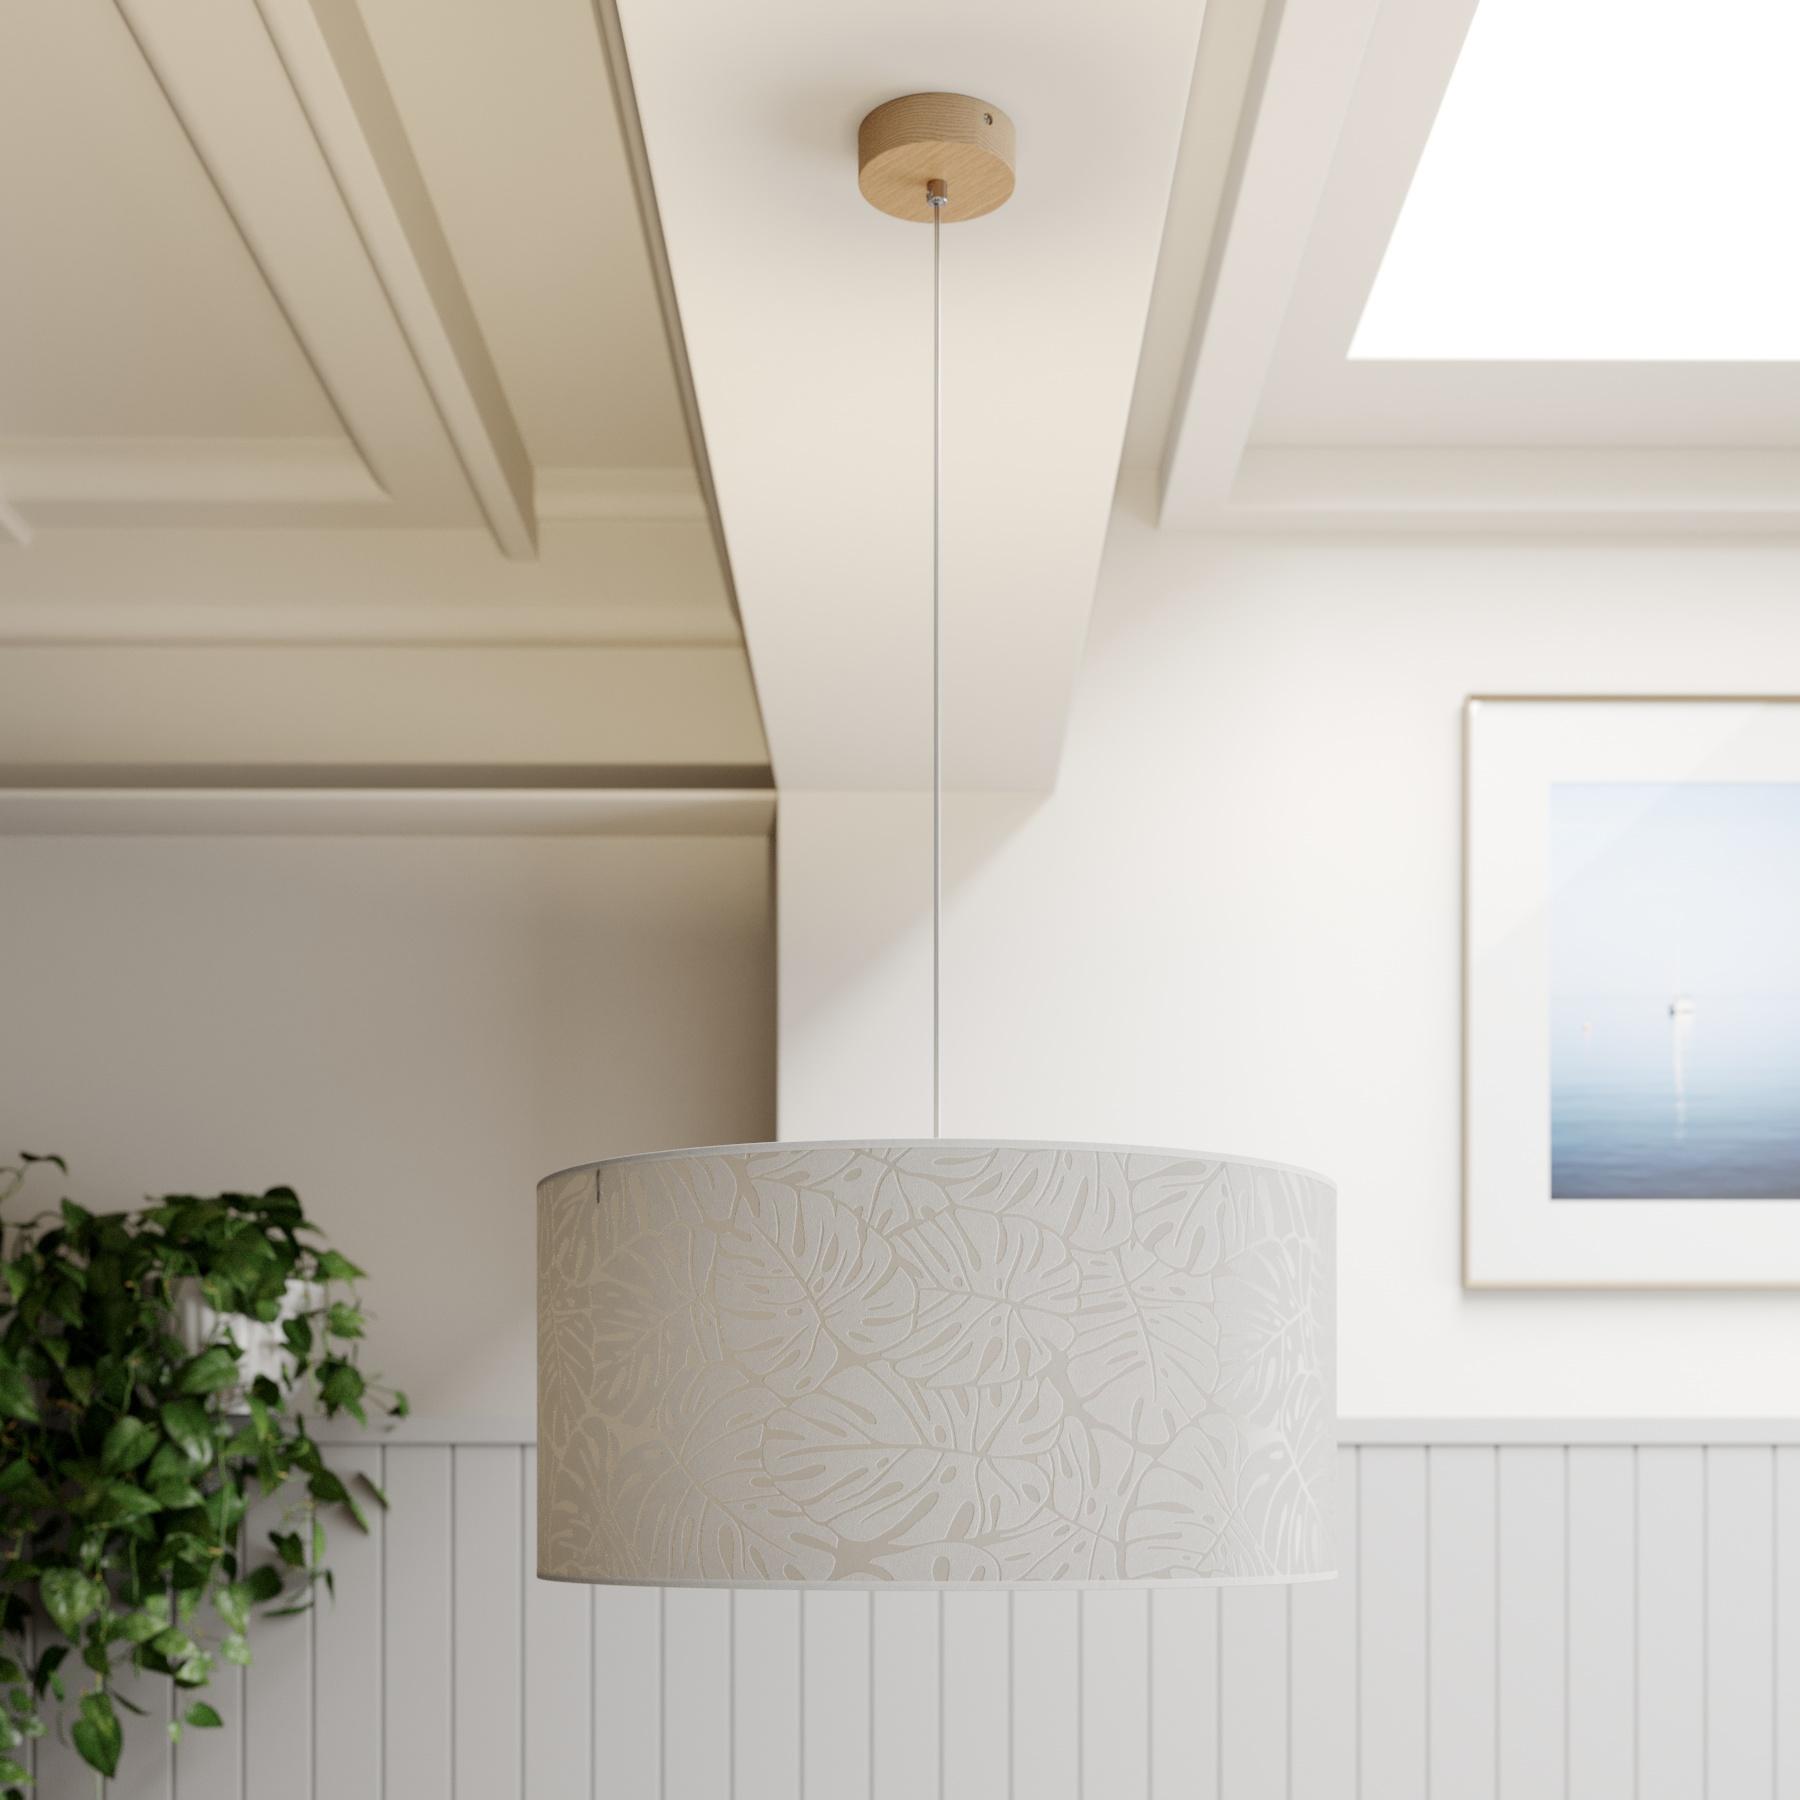 Hanglamp Hierro, kap rond Ø 50 cm